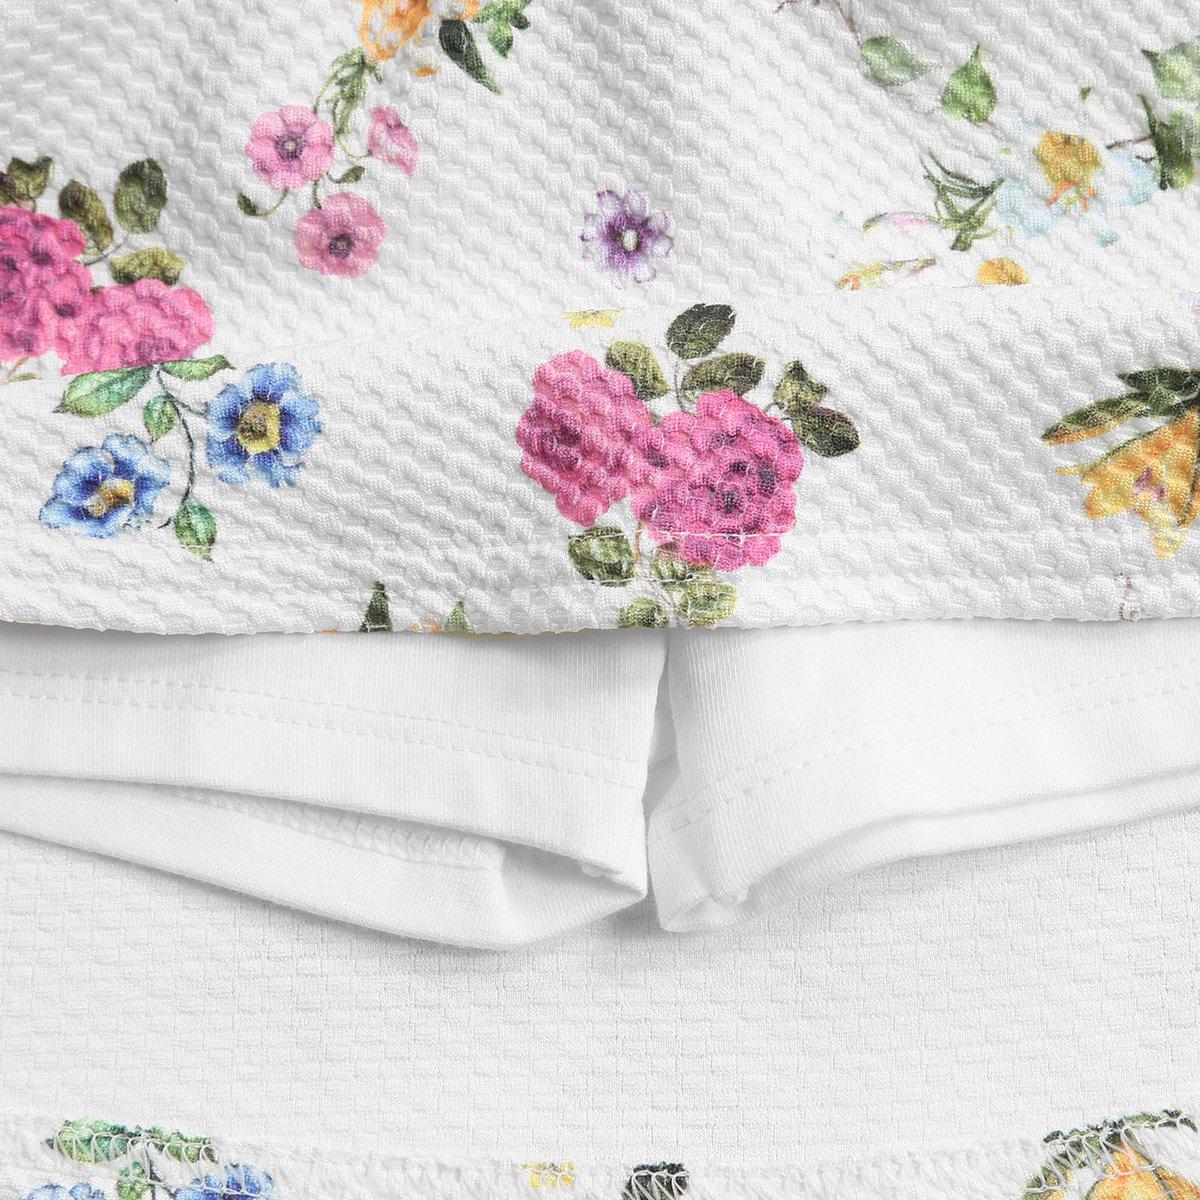 White Conjunto Malha Jacquard Infantil Floral Forro Off Feminino com qq8zxwUC